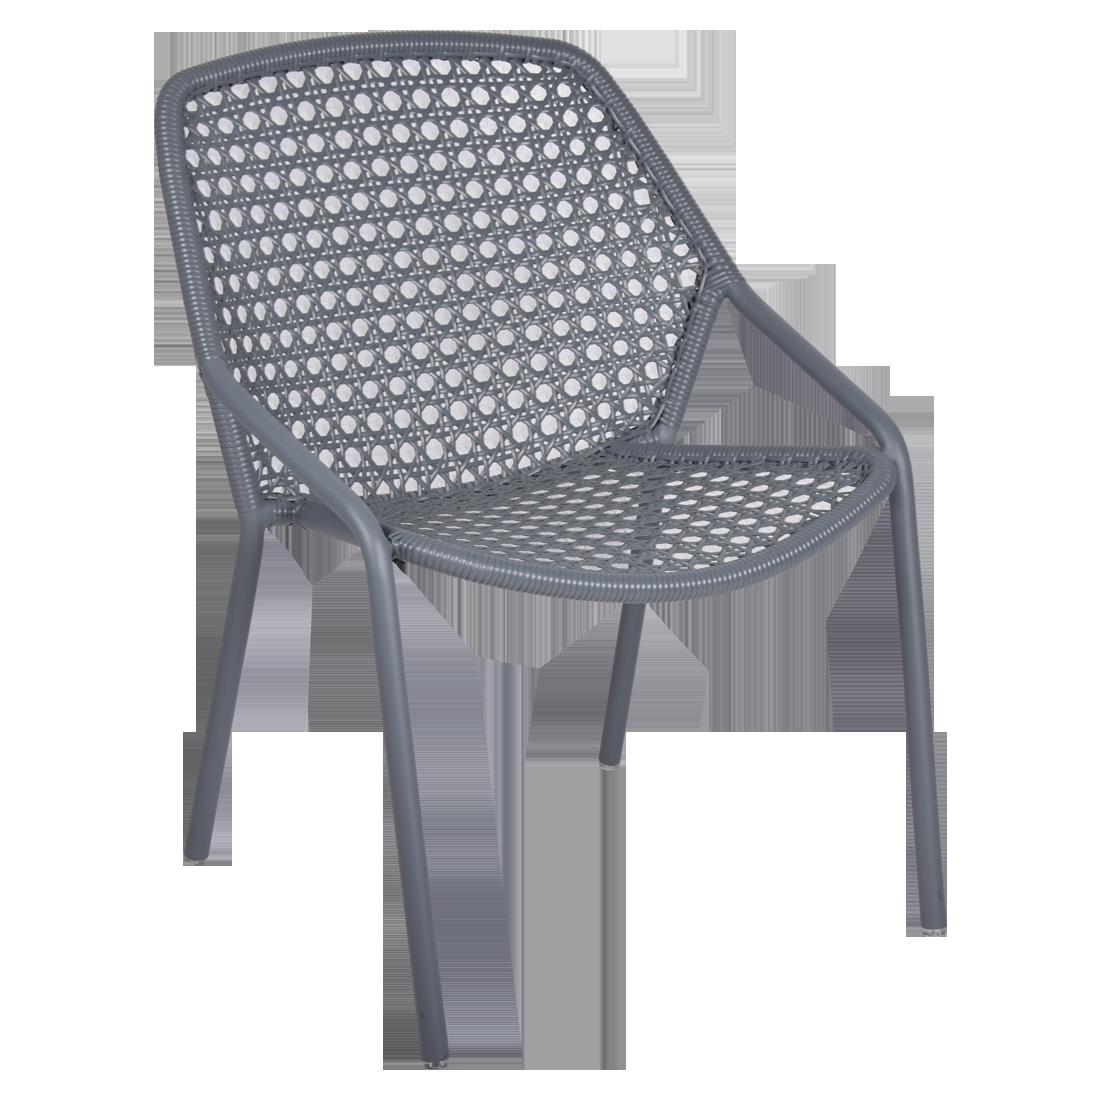 fauteuil de jardin, fauteuil fermob, fauteuil gris